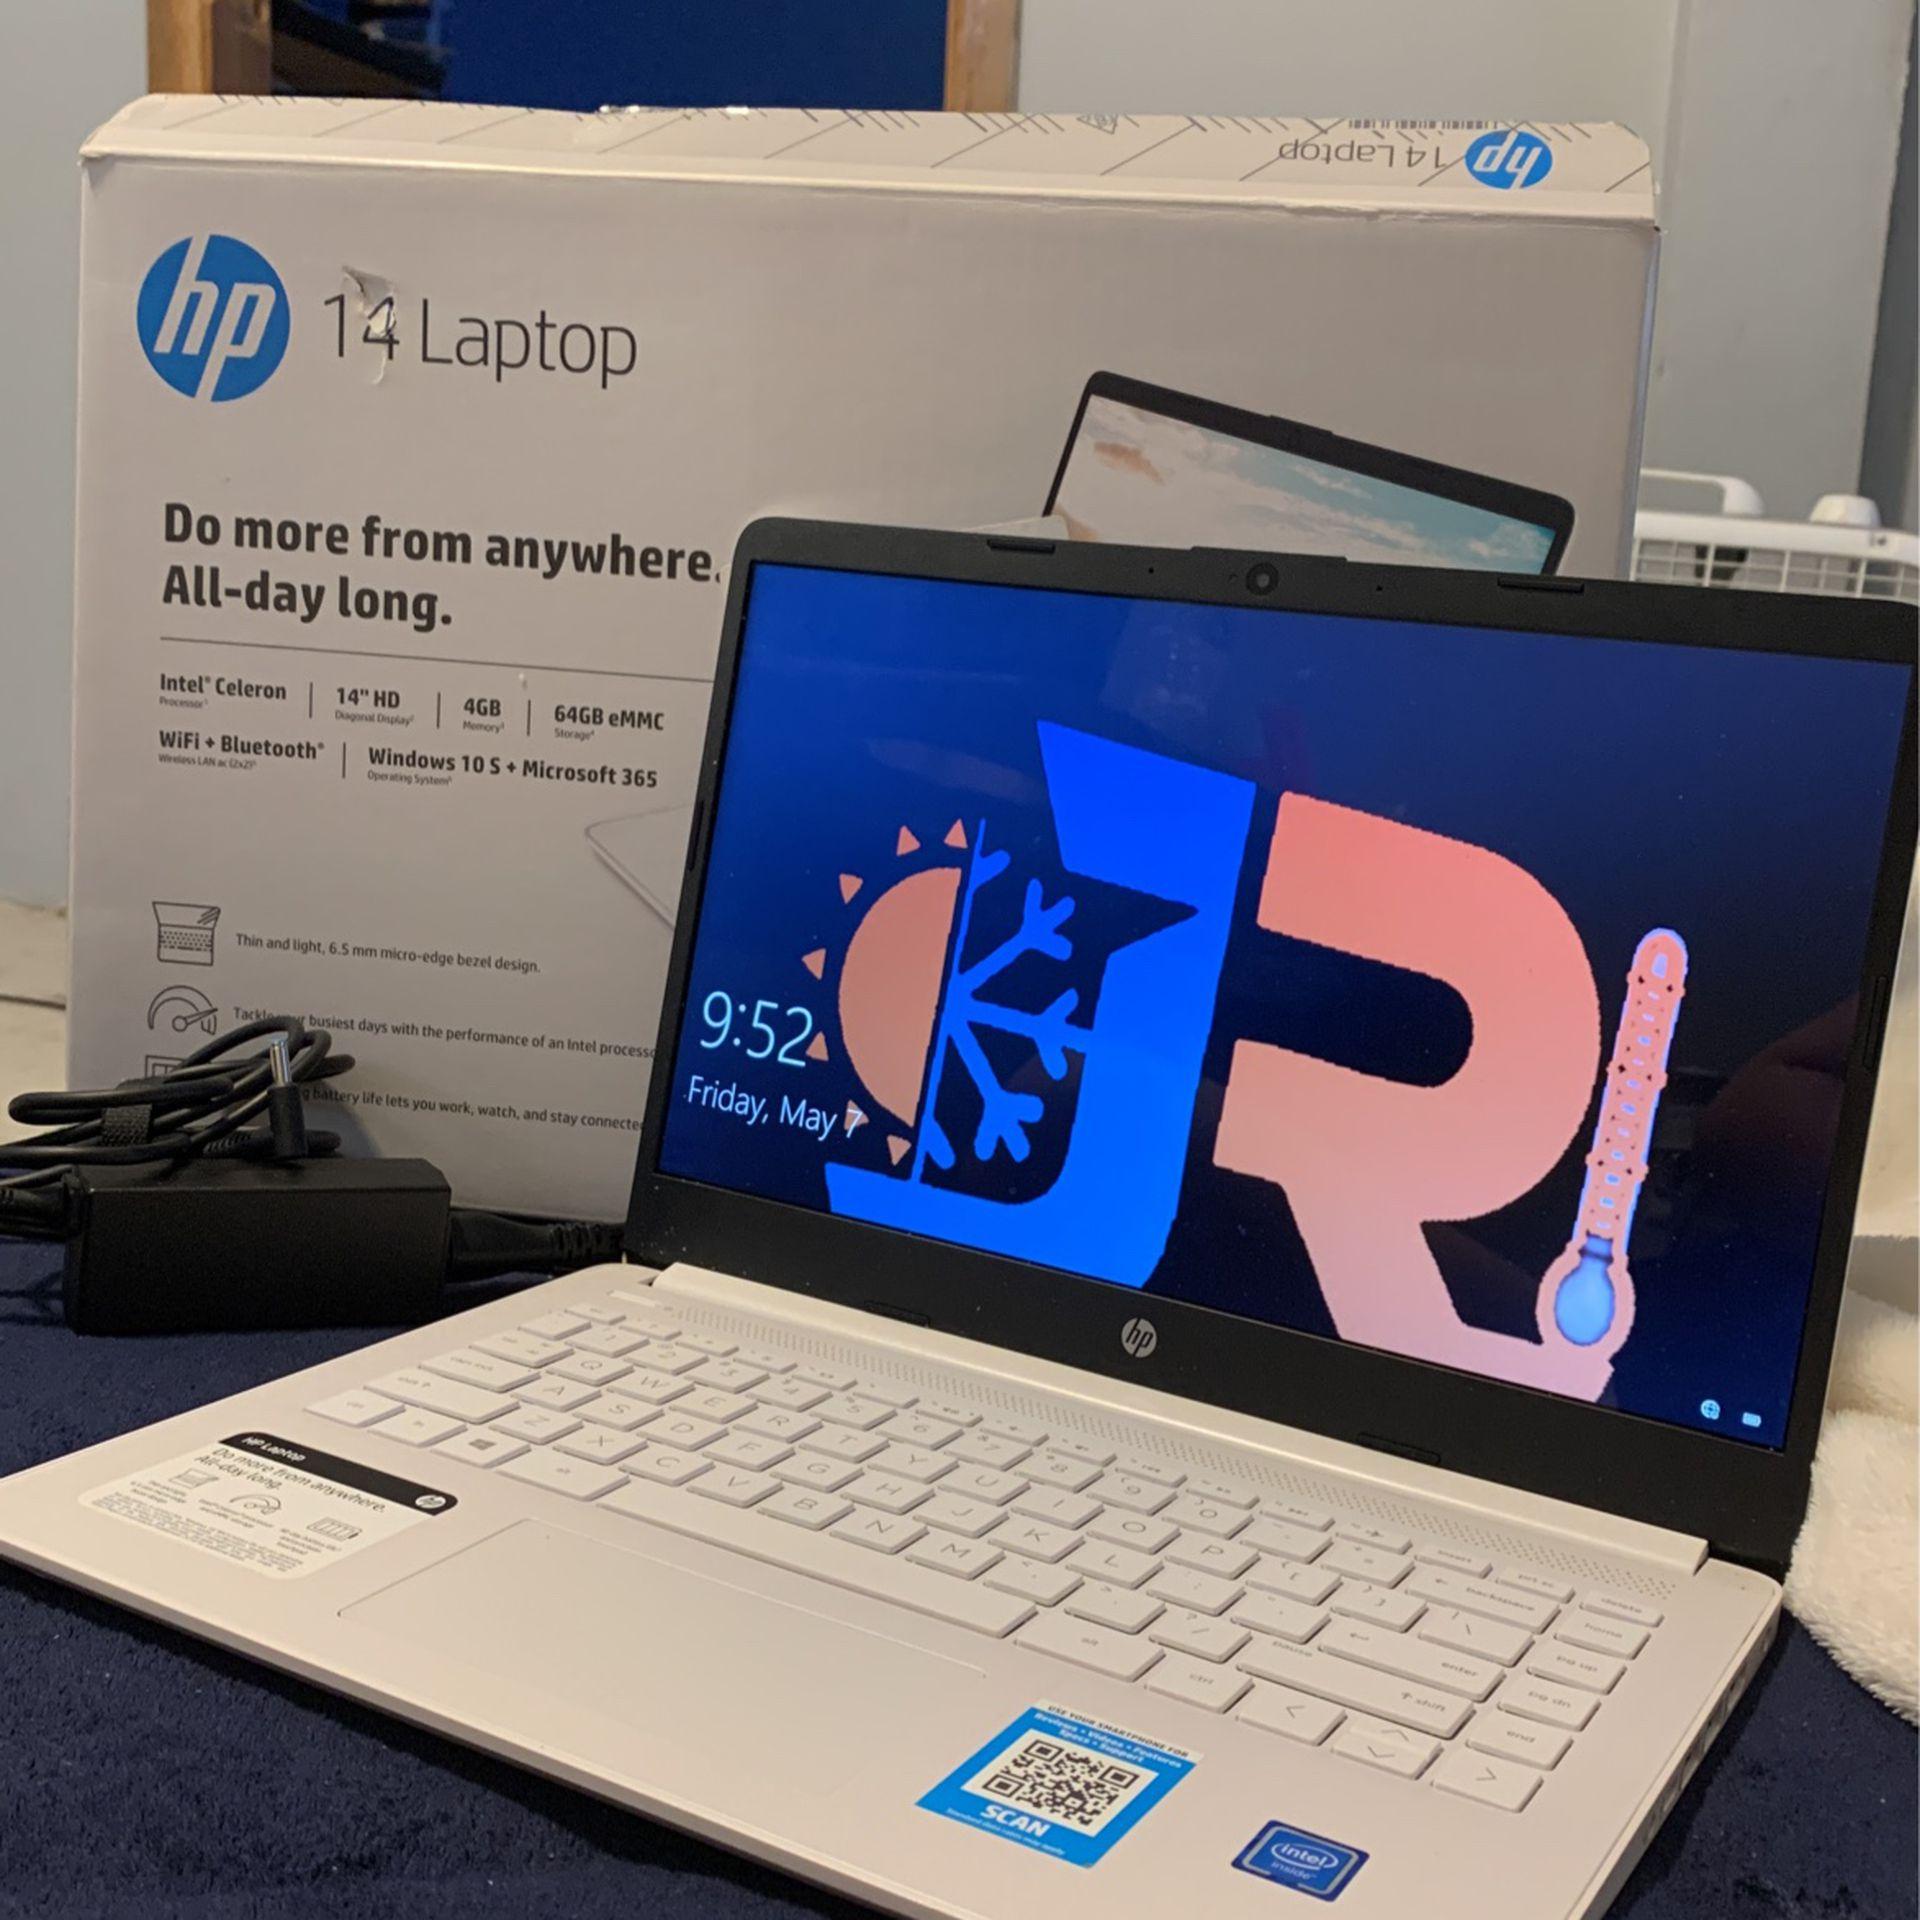 HP 14 Latop,  White